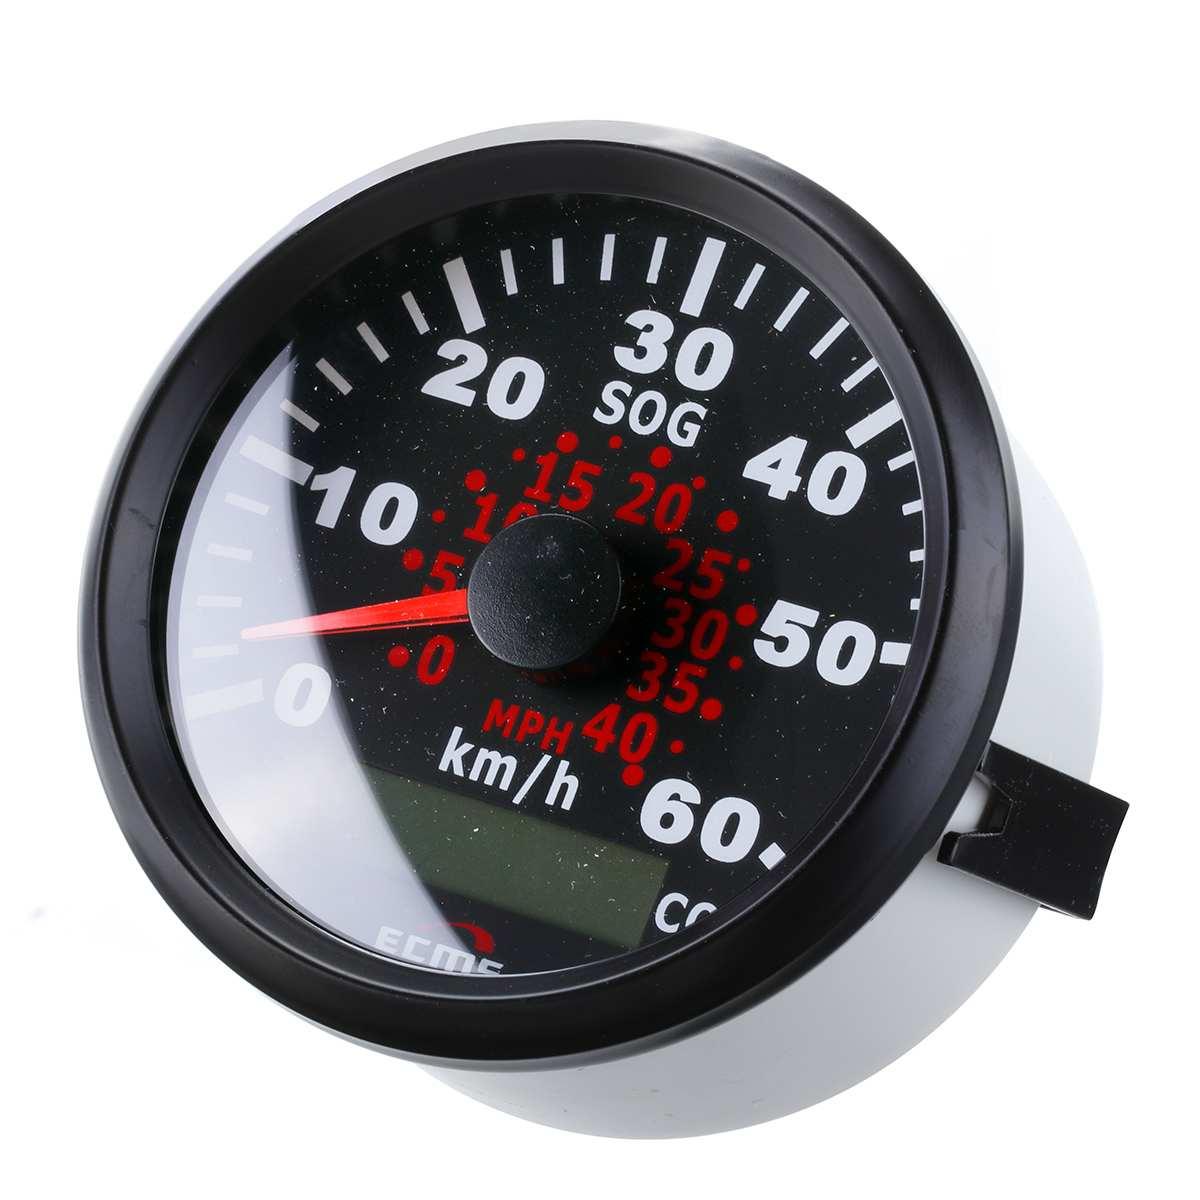 85mm Auto Car Truck Marine GPS Speedometer Waterproof Speed Sensor Meter Gauge Digital Odometer Automobiles Replacement Parts 6